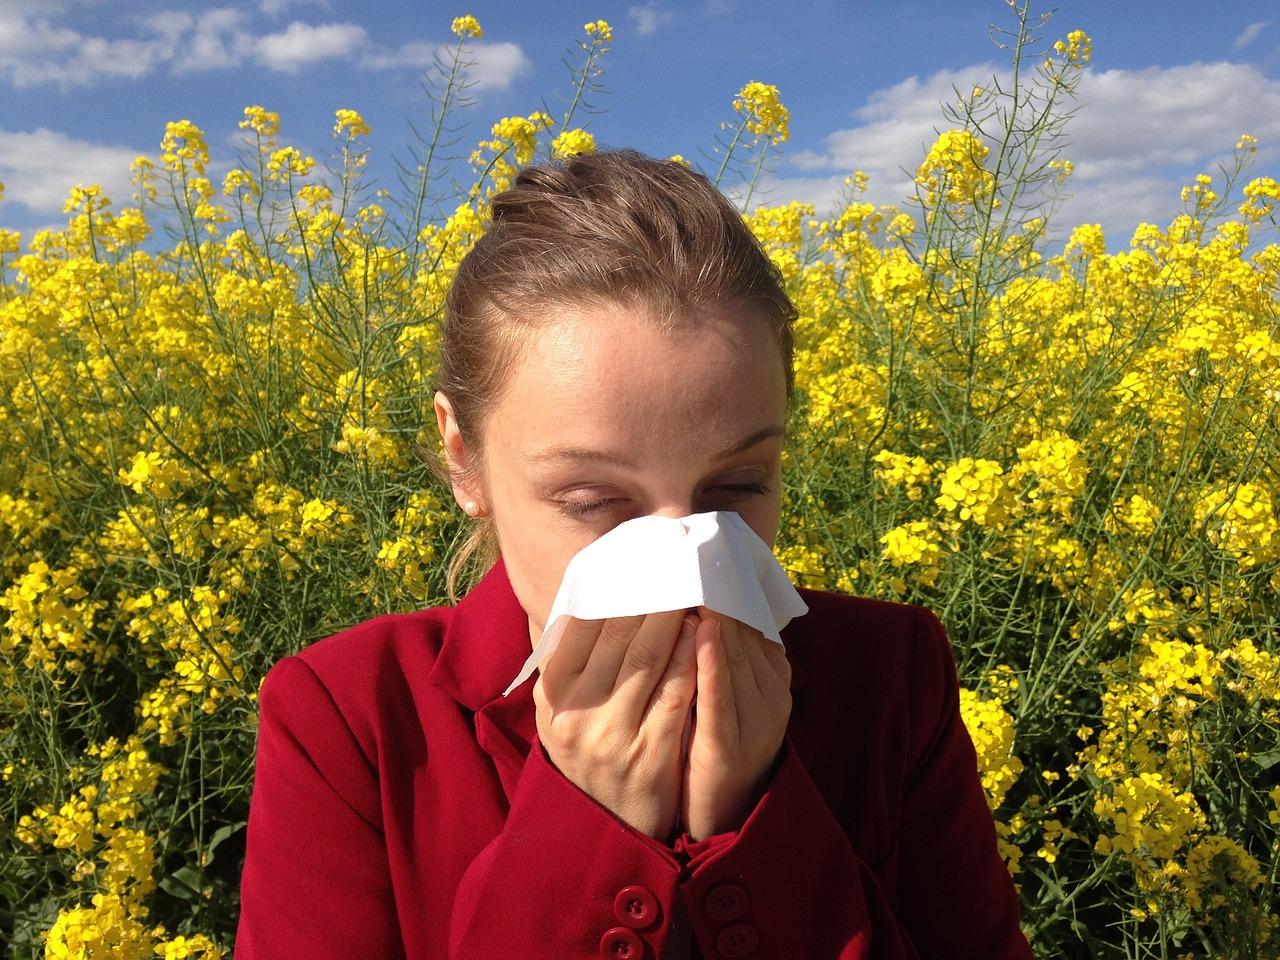 Uen femme en plein crise d'allergie au pollen